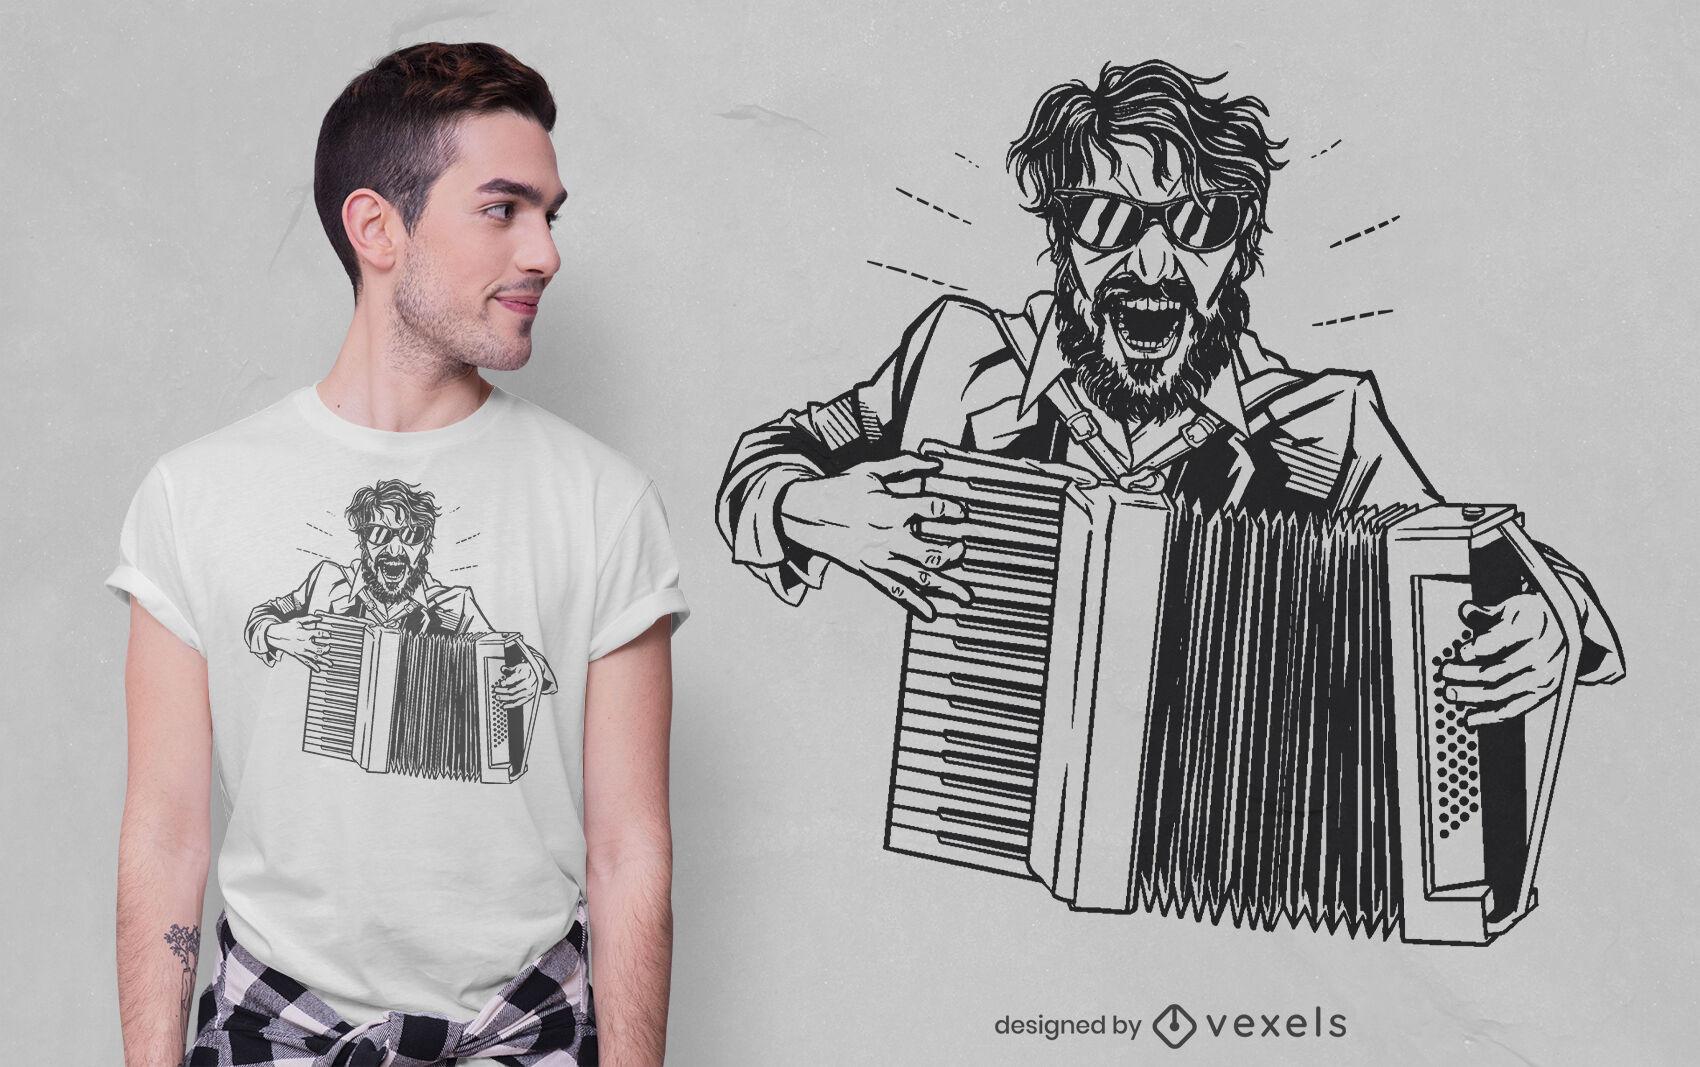 Crazy accordion player t-shirt design